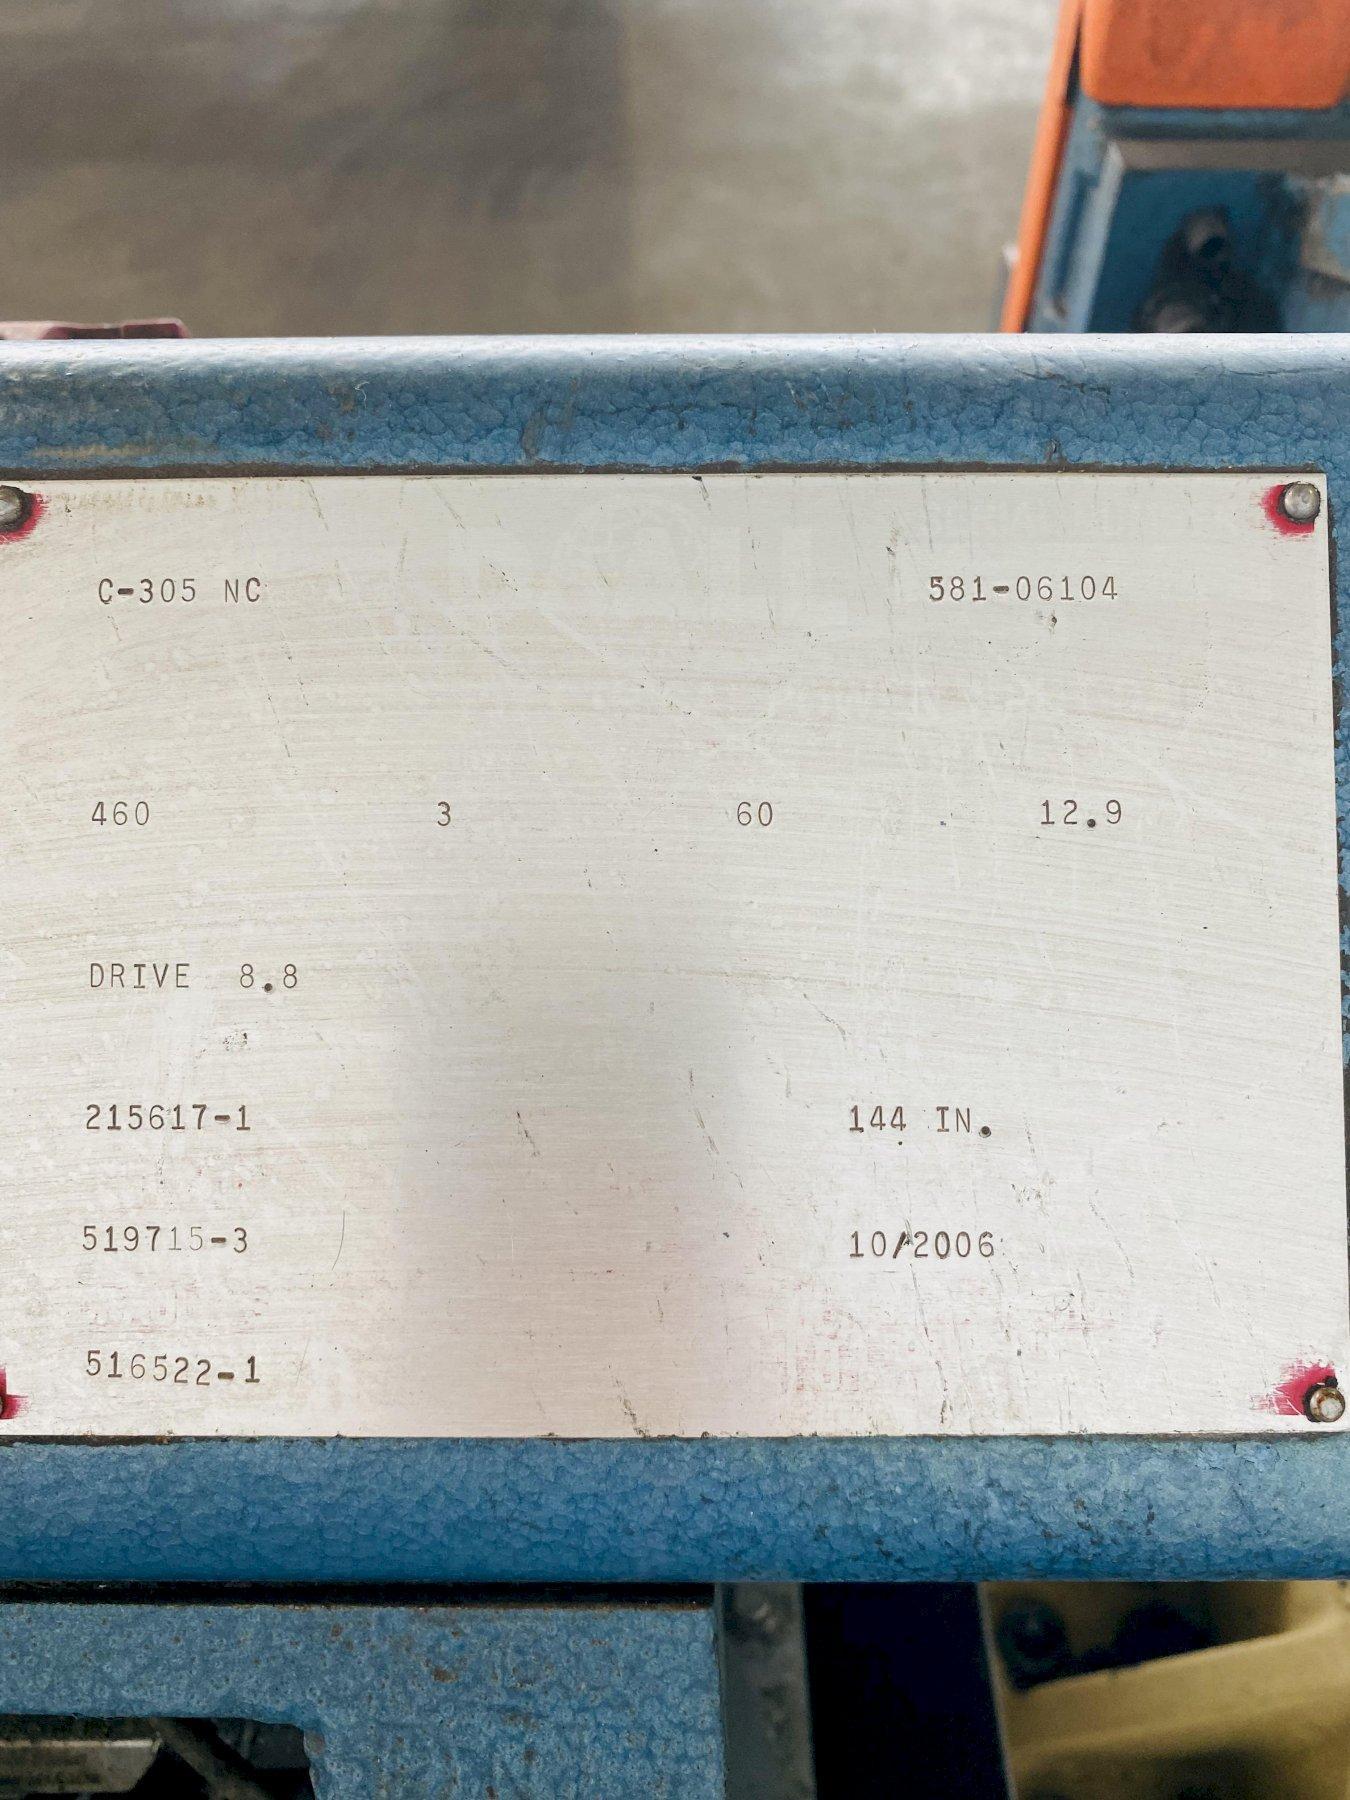 "10"" DOALL MODEL #C-305 NC HORIZONTAL BANDSAW. STOCK # 0632521"